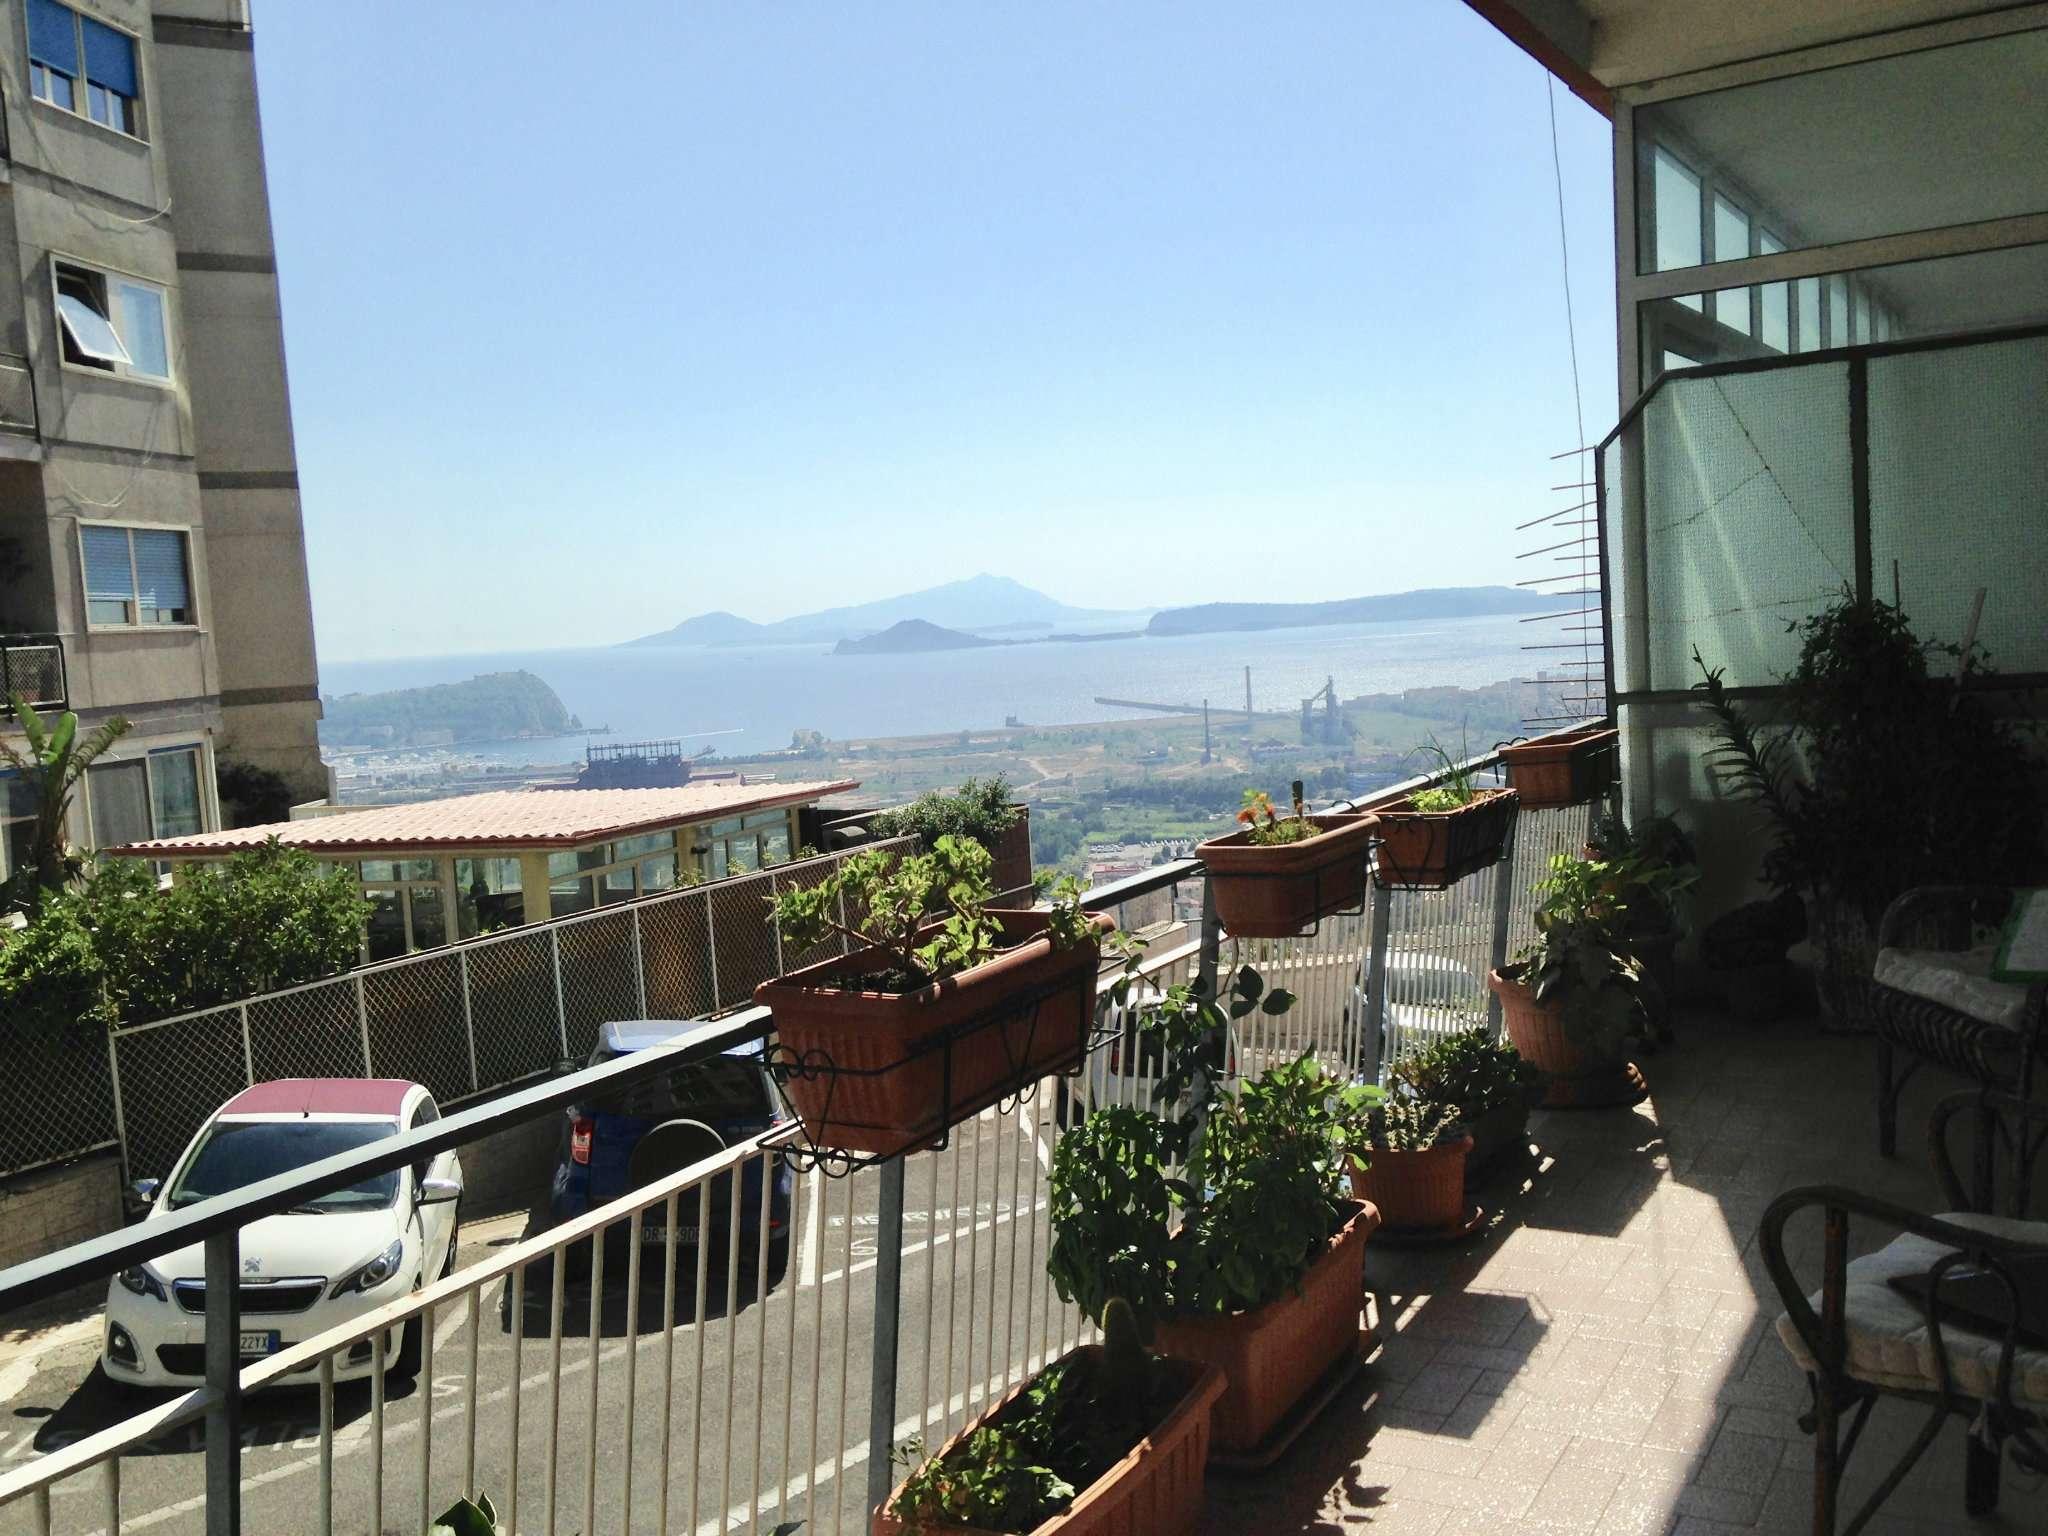 Appartamento con giardino privato a napoli pag 3 - Casa con giardino napoli ...